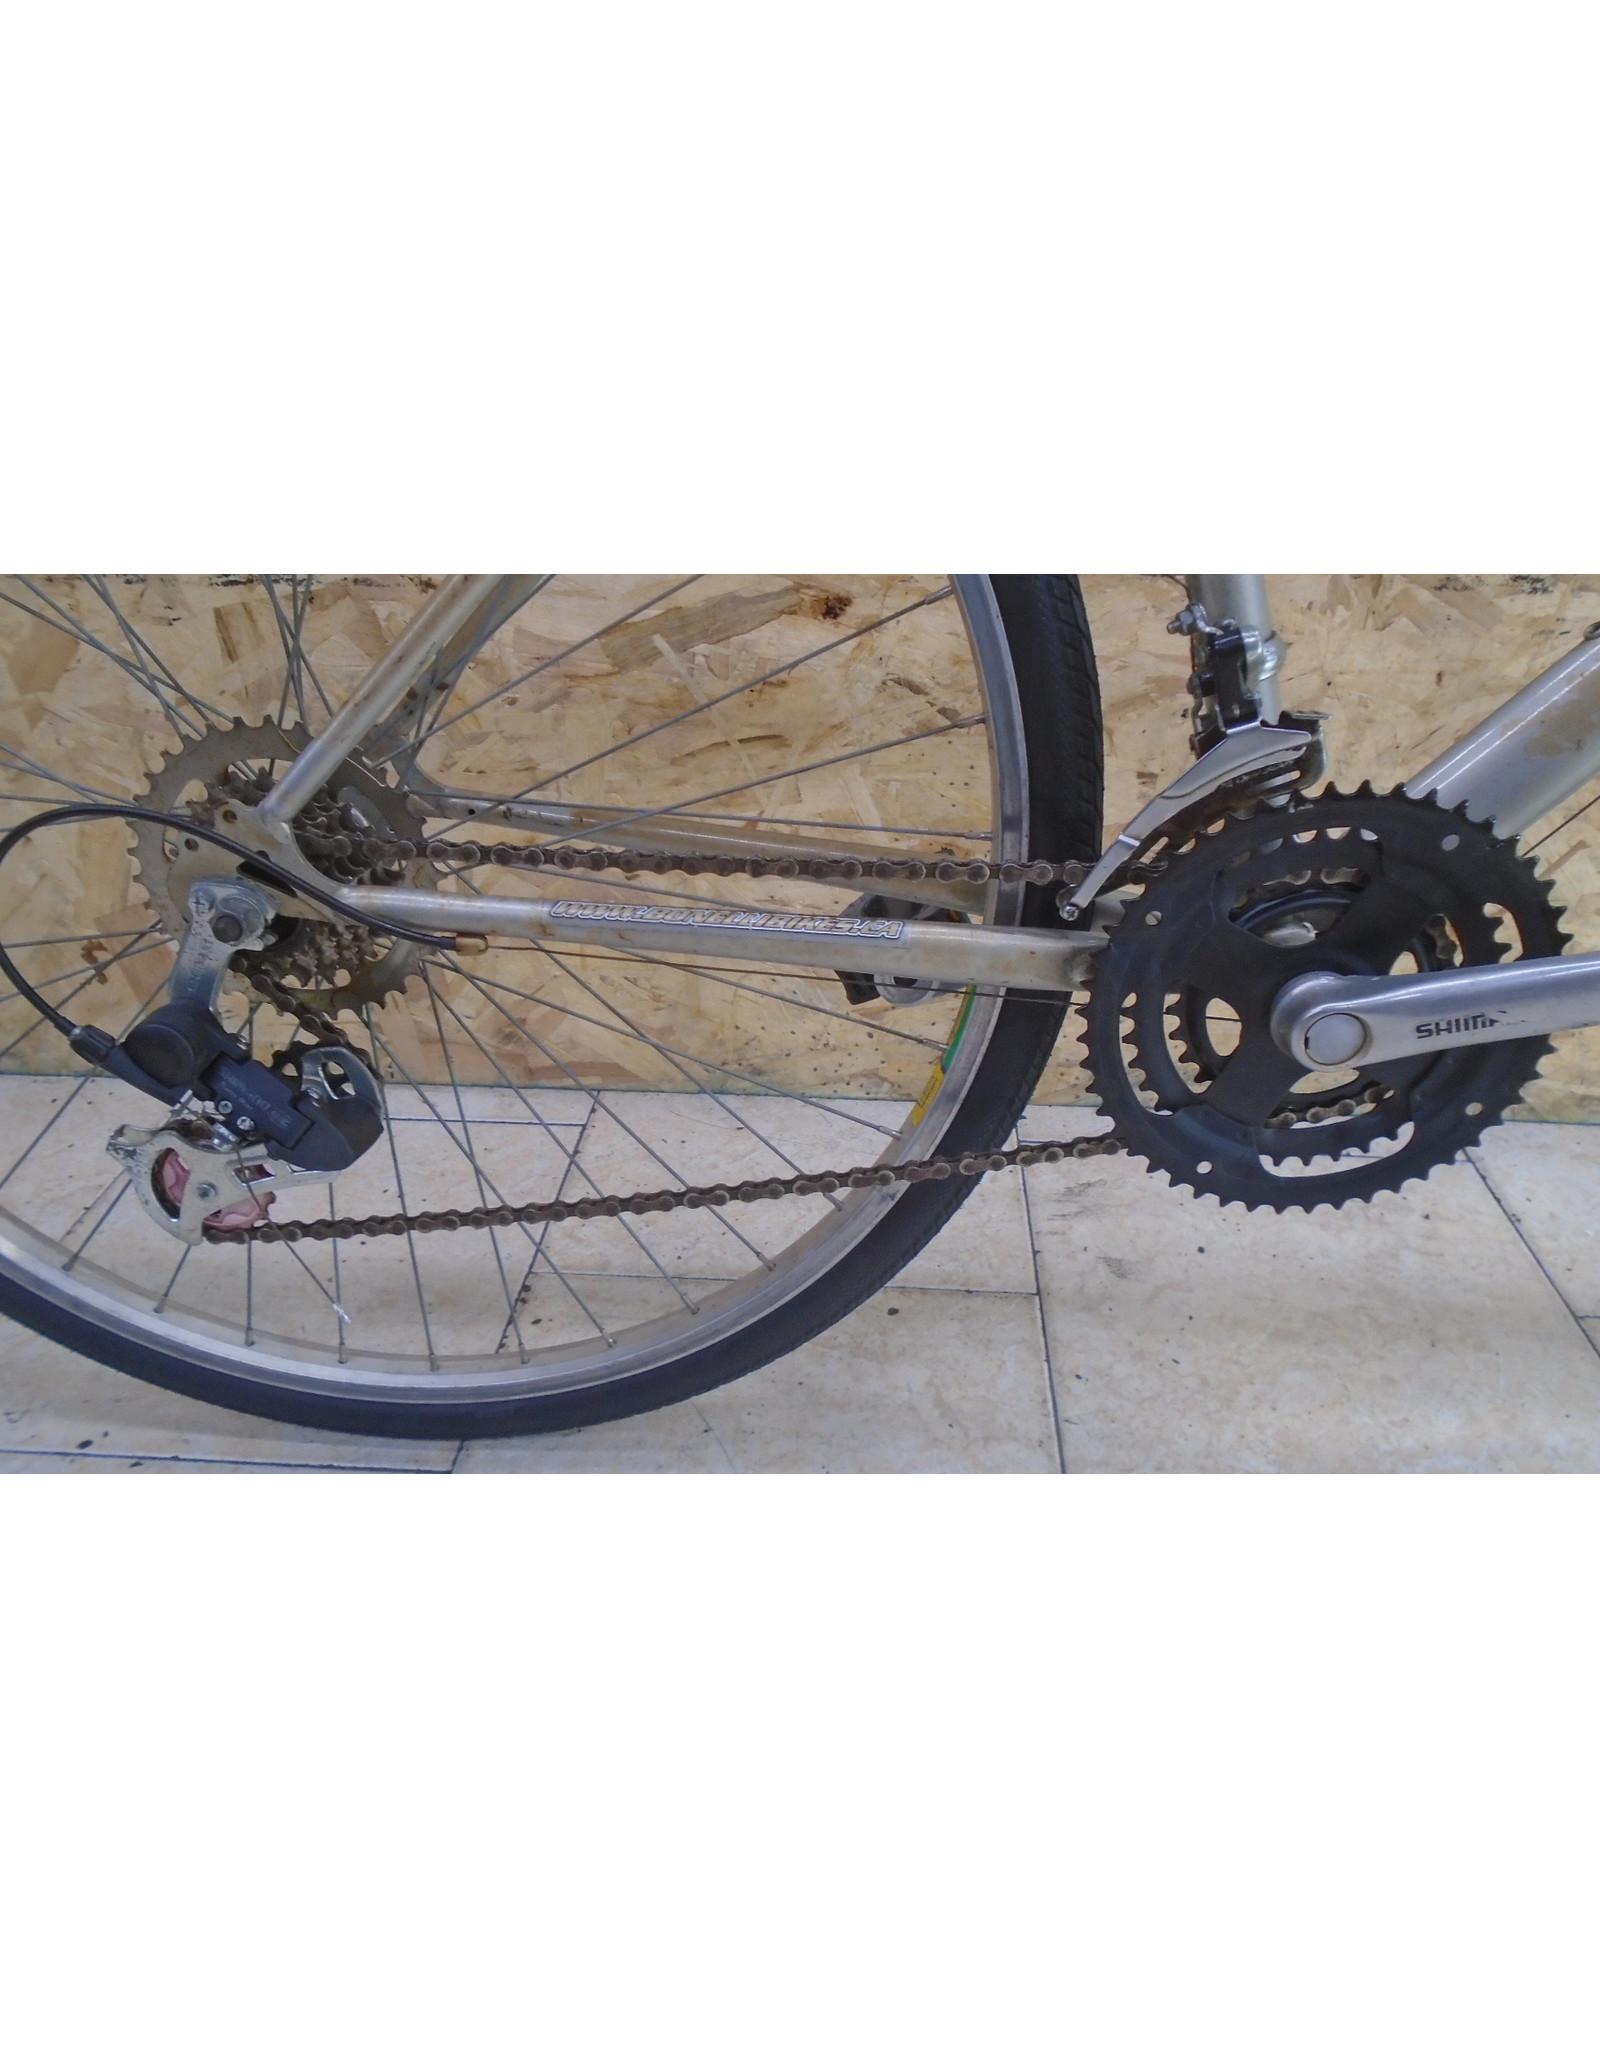 "Vélo usagé hybride Bonelli 18"" - 10126"